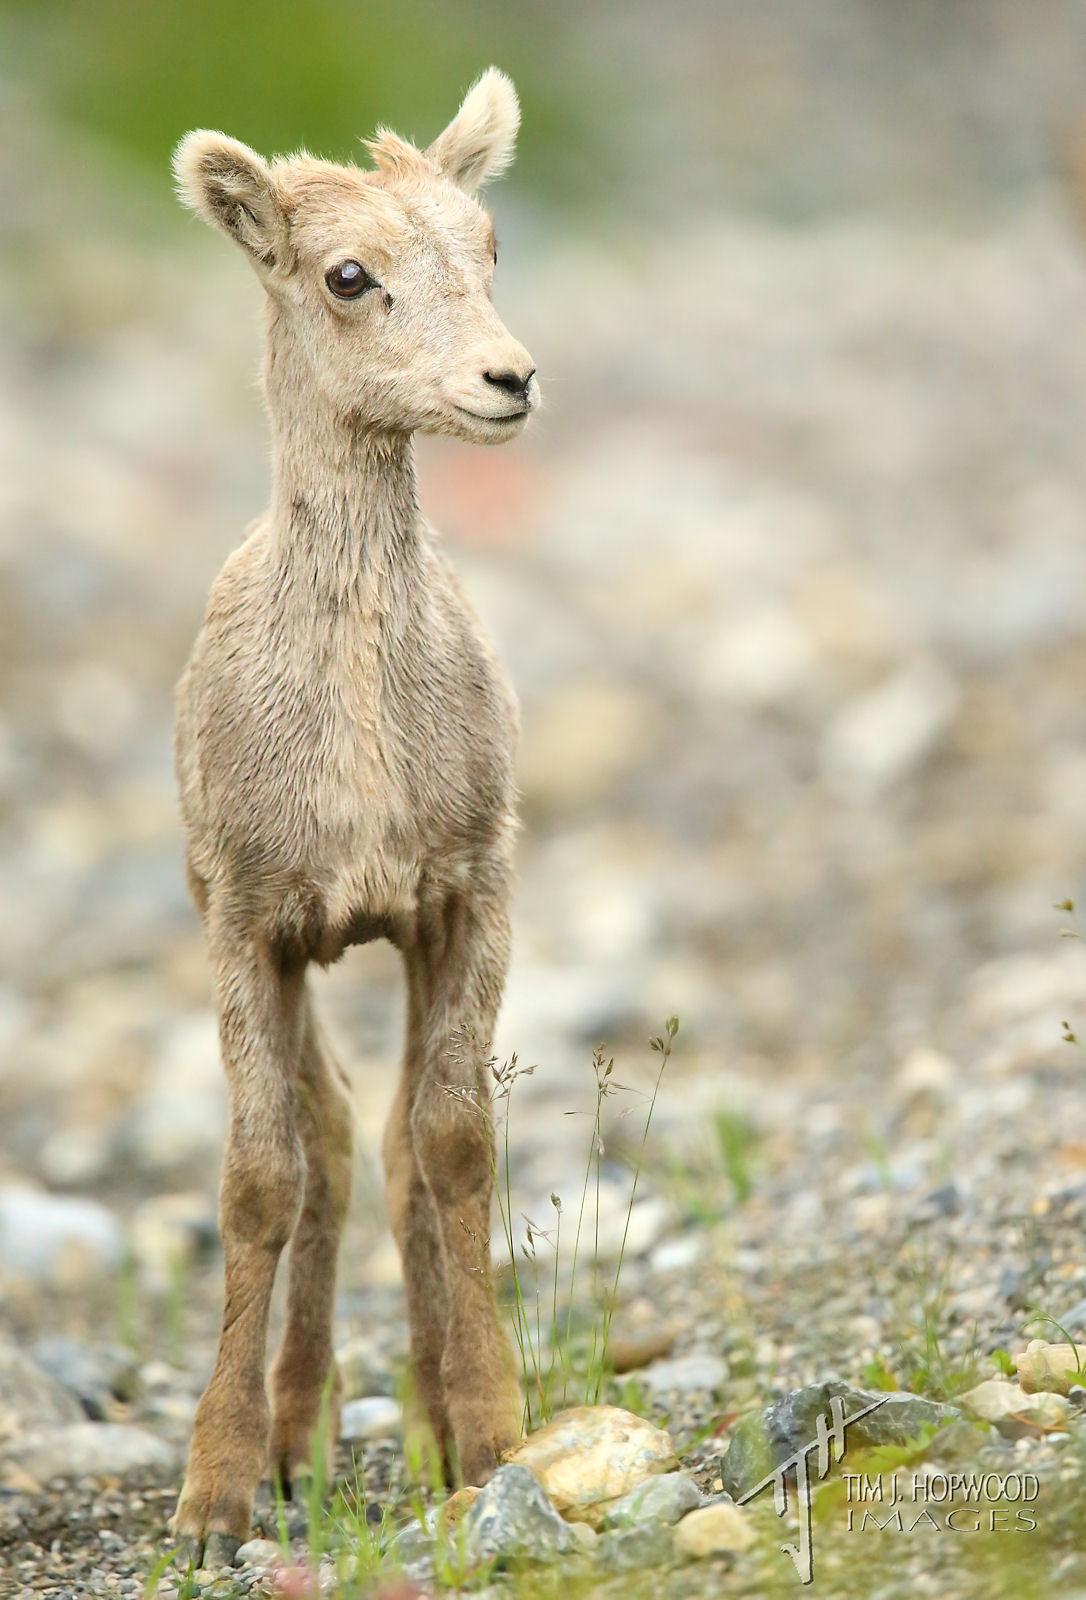 BighornSheep-3 Lamb